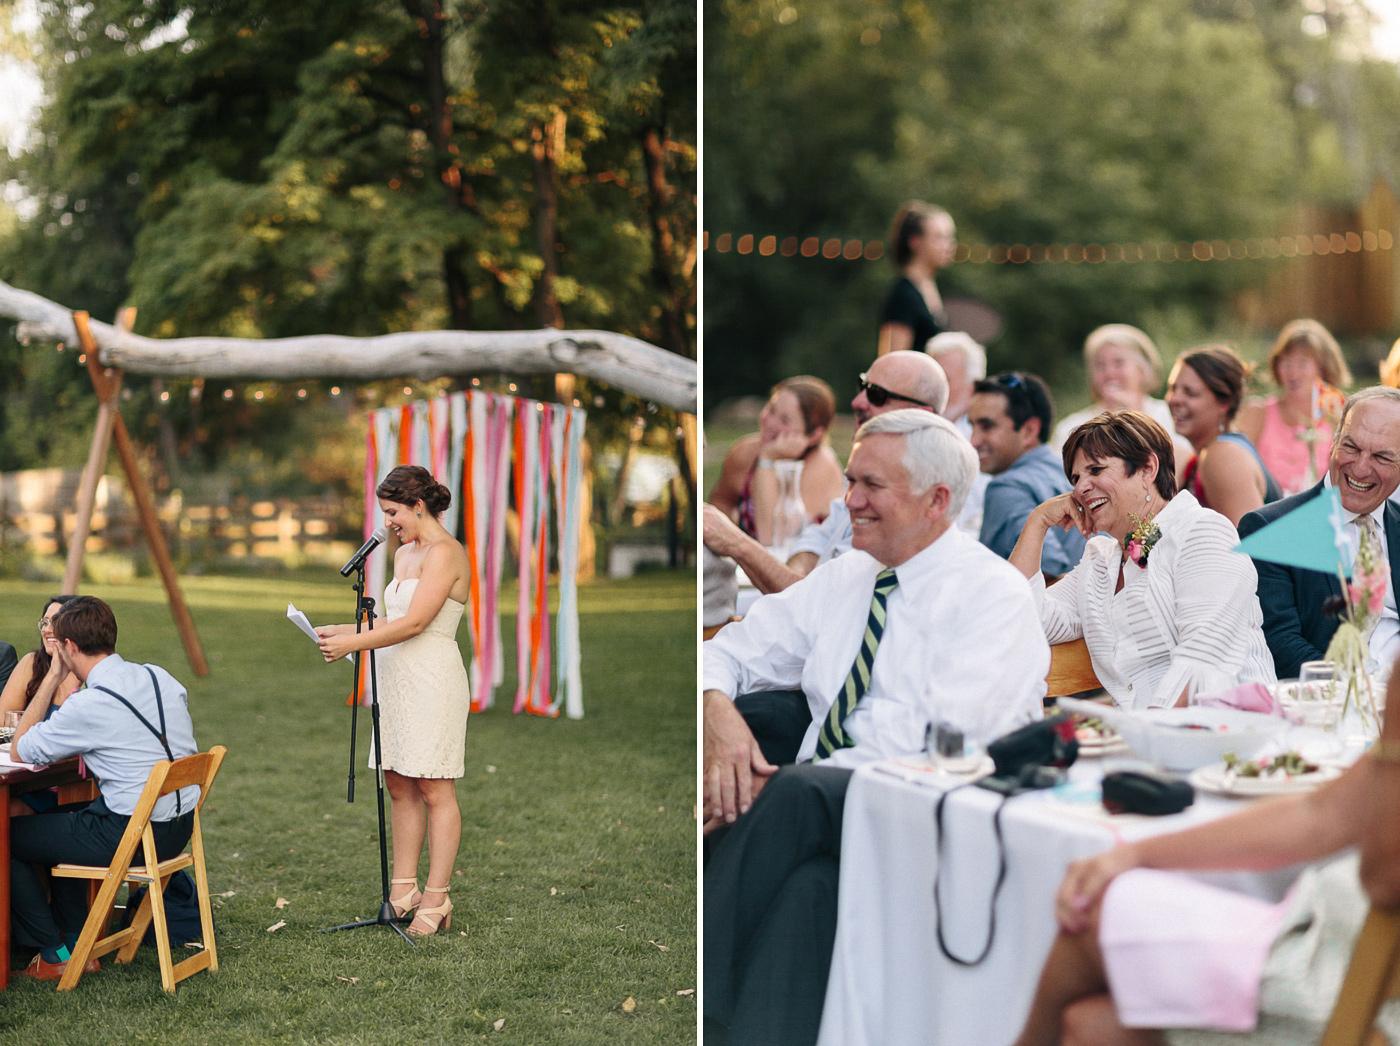 Lyons-Farmette-Wedding-Photographer-Lucy-Austin-Flash-Mob-Dance-47.jpg